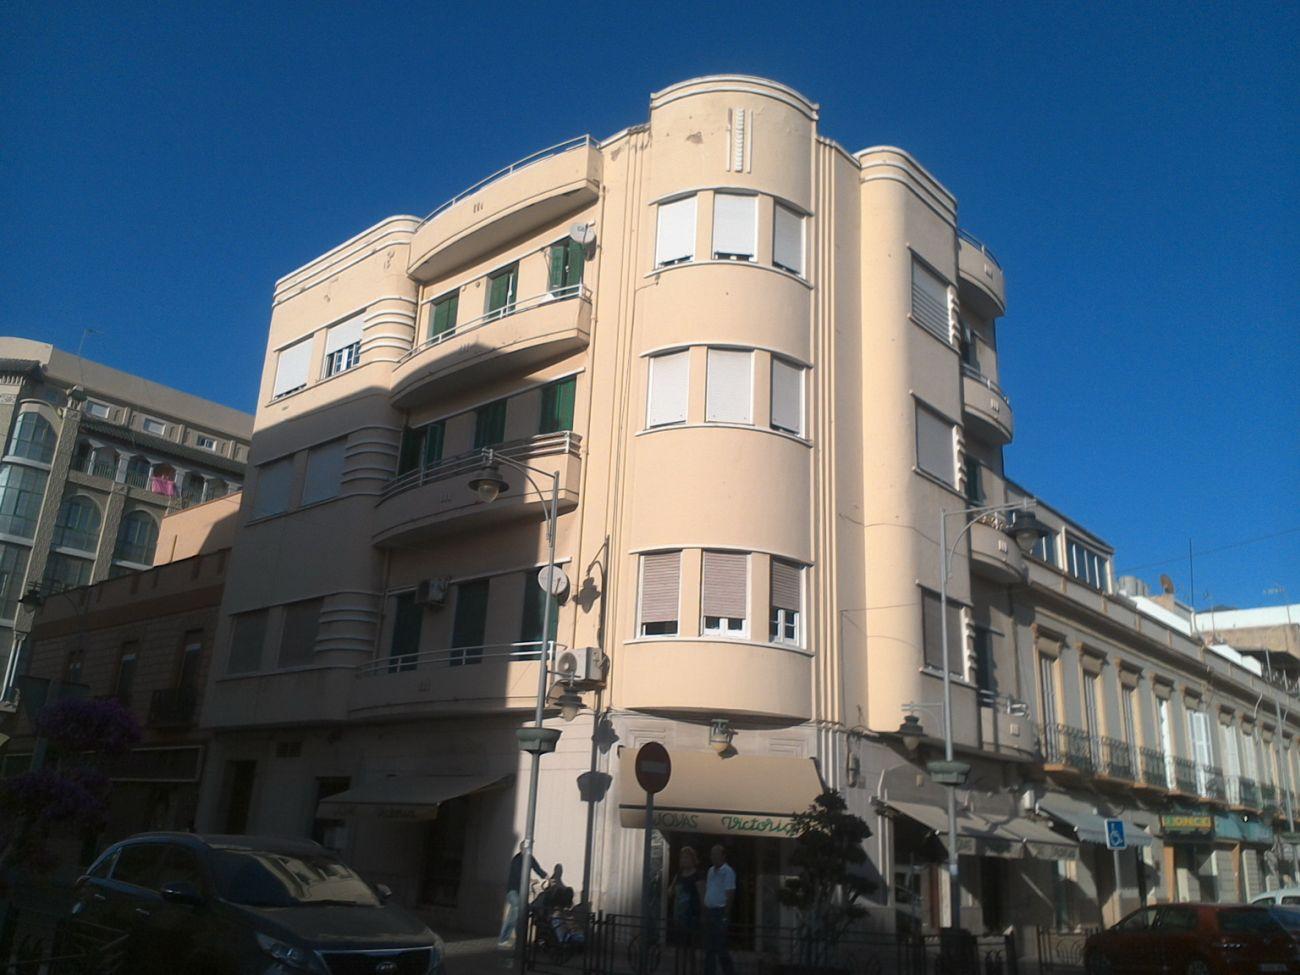 Calle Abdelkader, 6